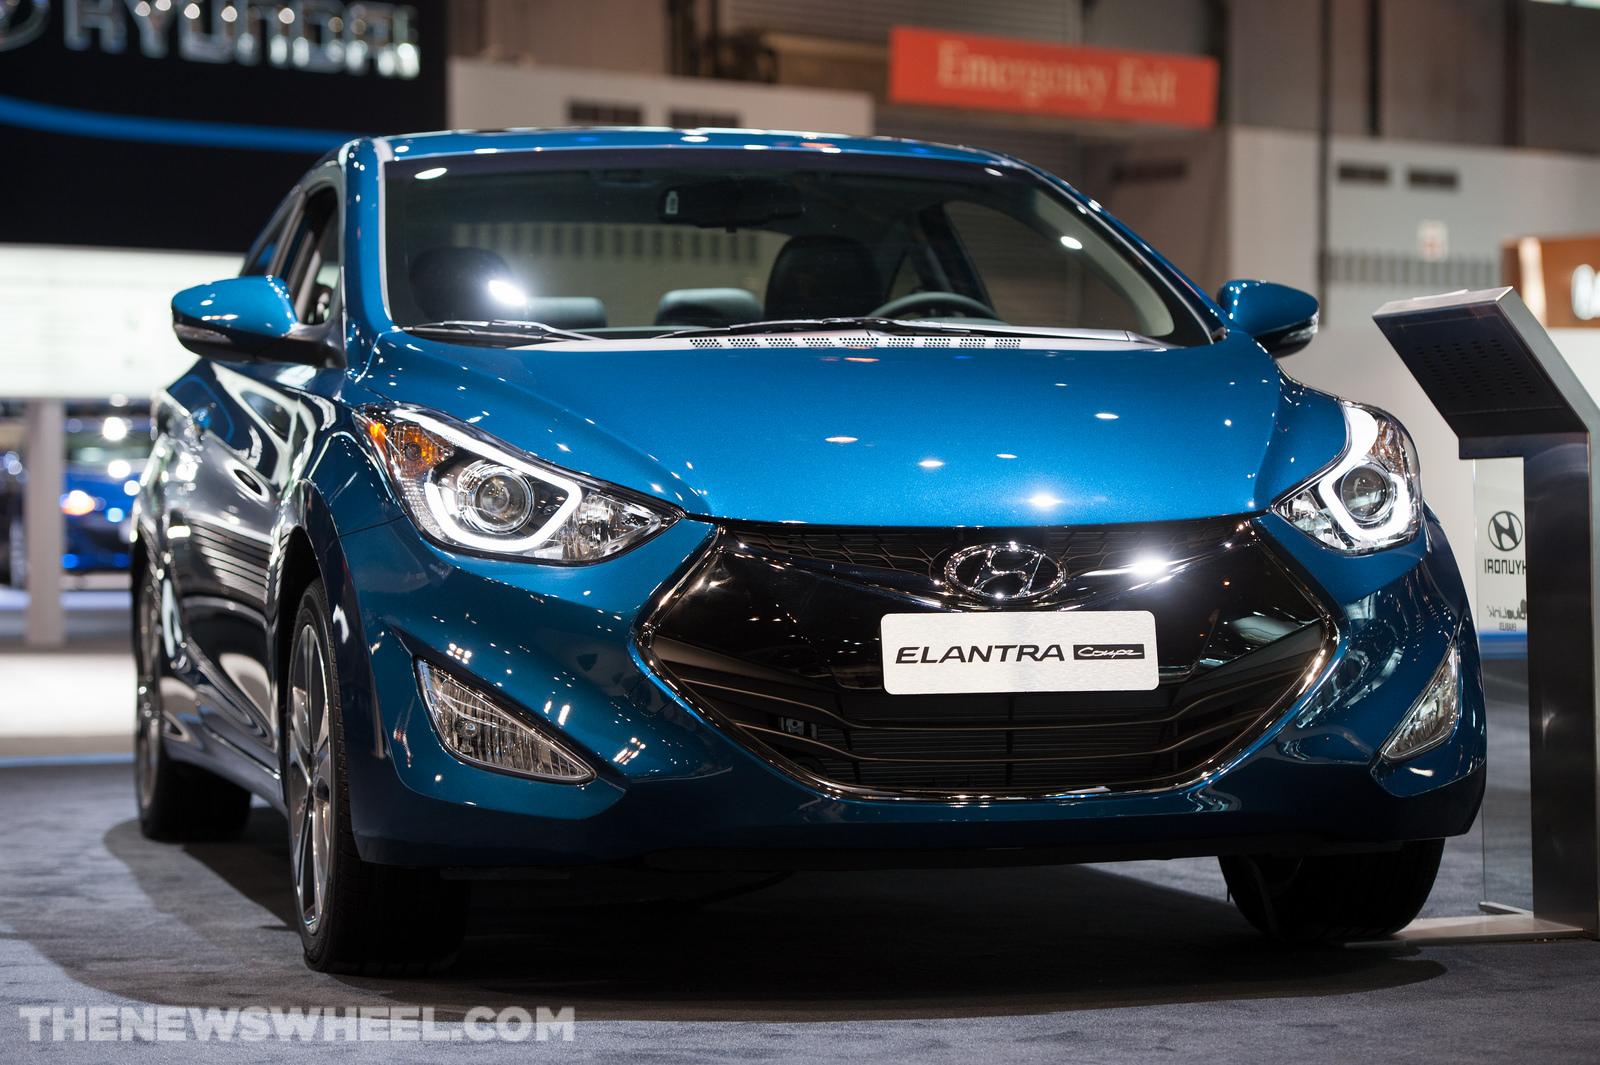 Hyundai Elantra Coupe >> 2014 Hyundai Elantra Coupe Overview The News Wheel